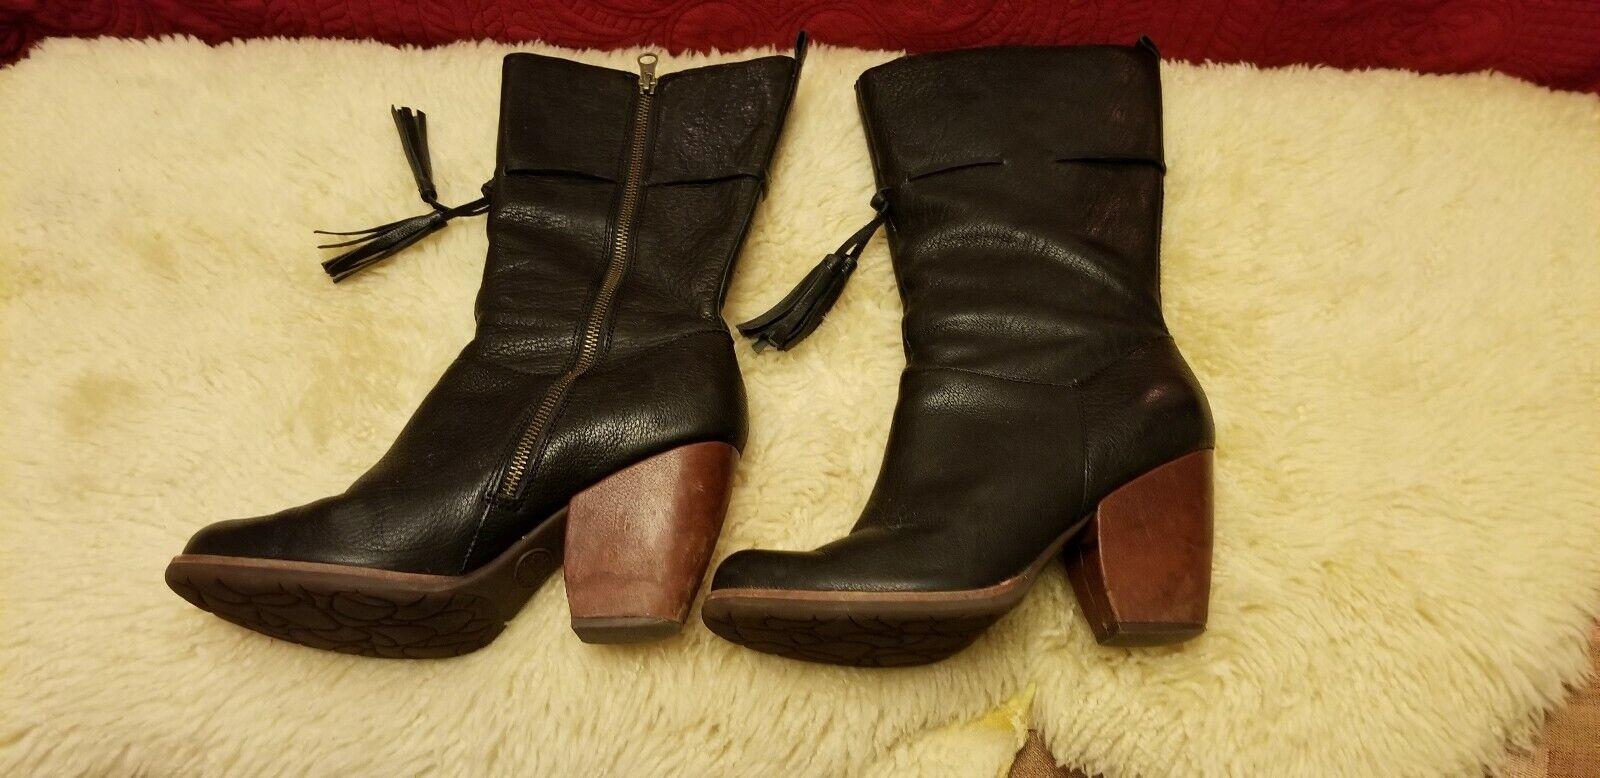 Boots, Kork Kork Kork ease boots 9, black,  Calf Length, Black W tassels 324d47